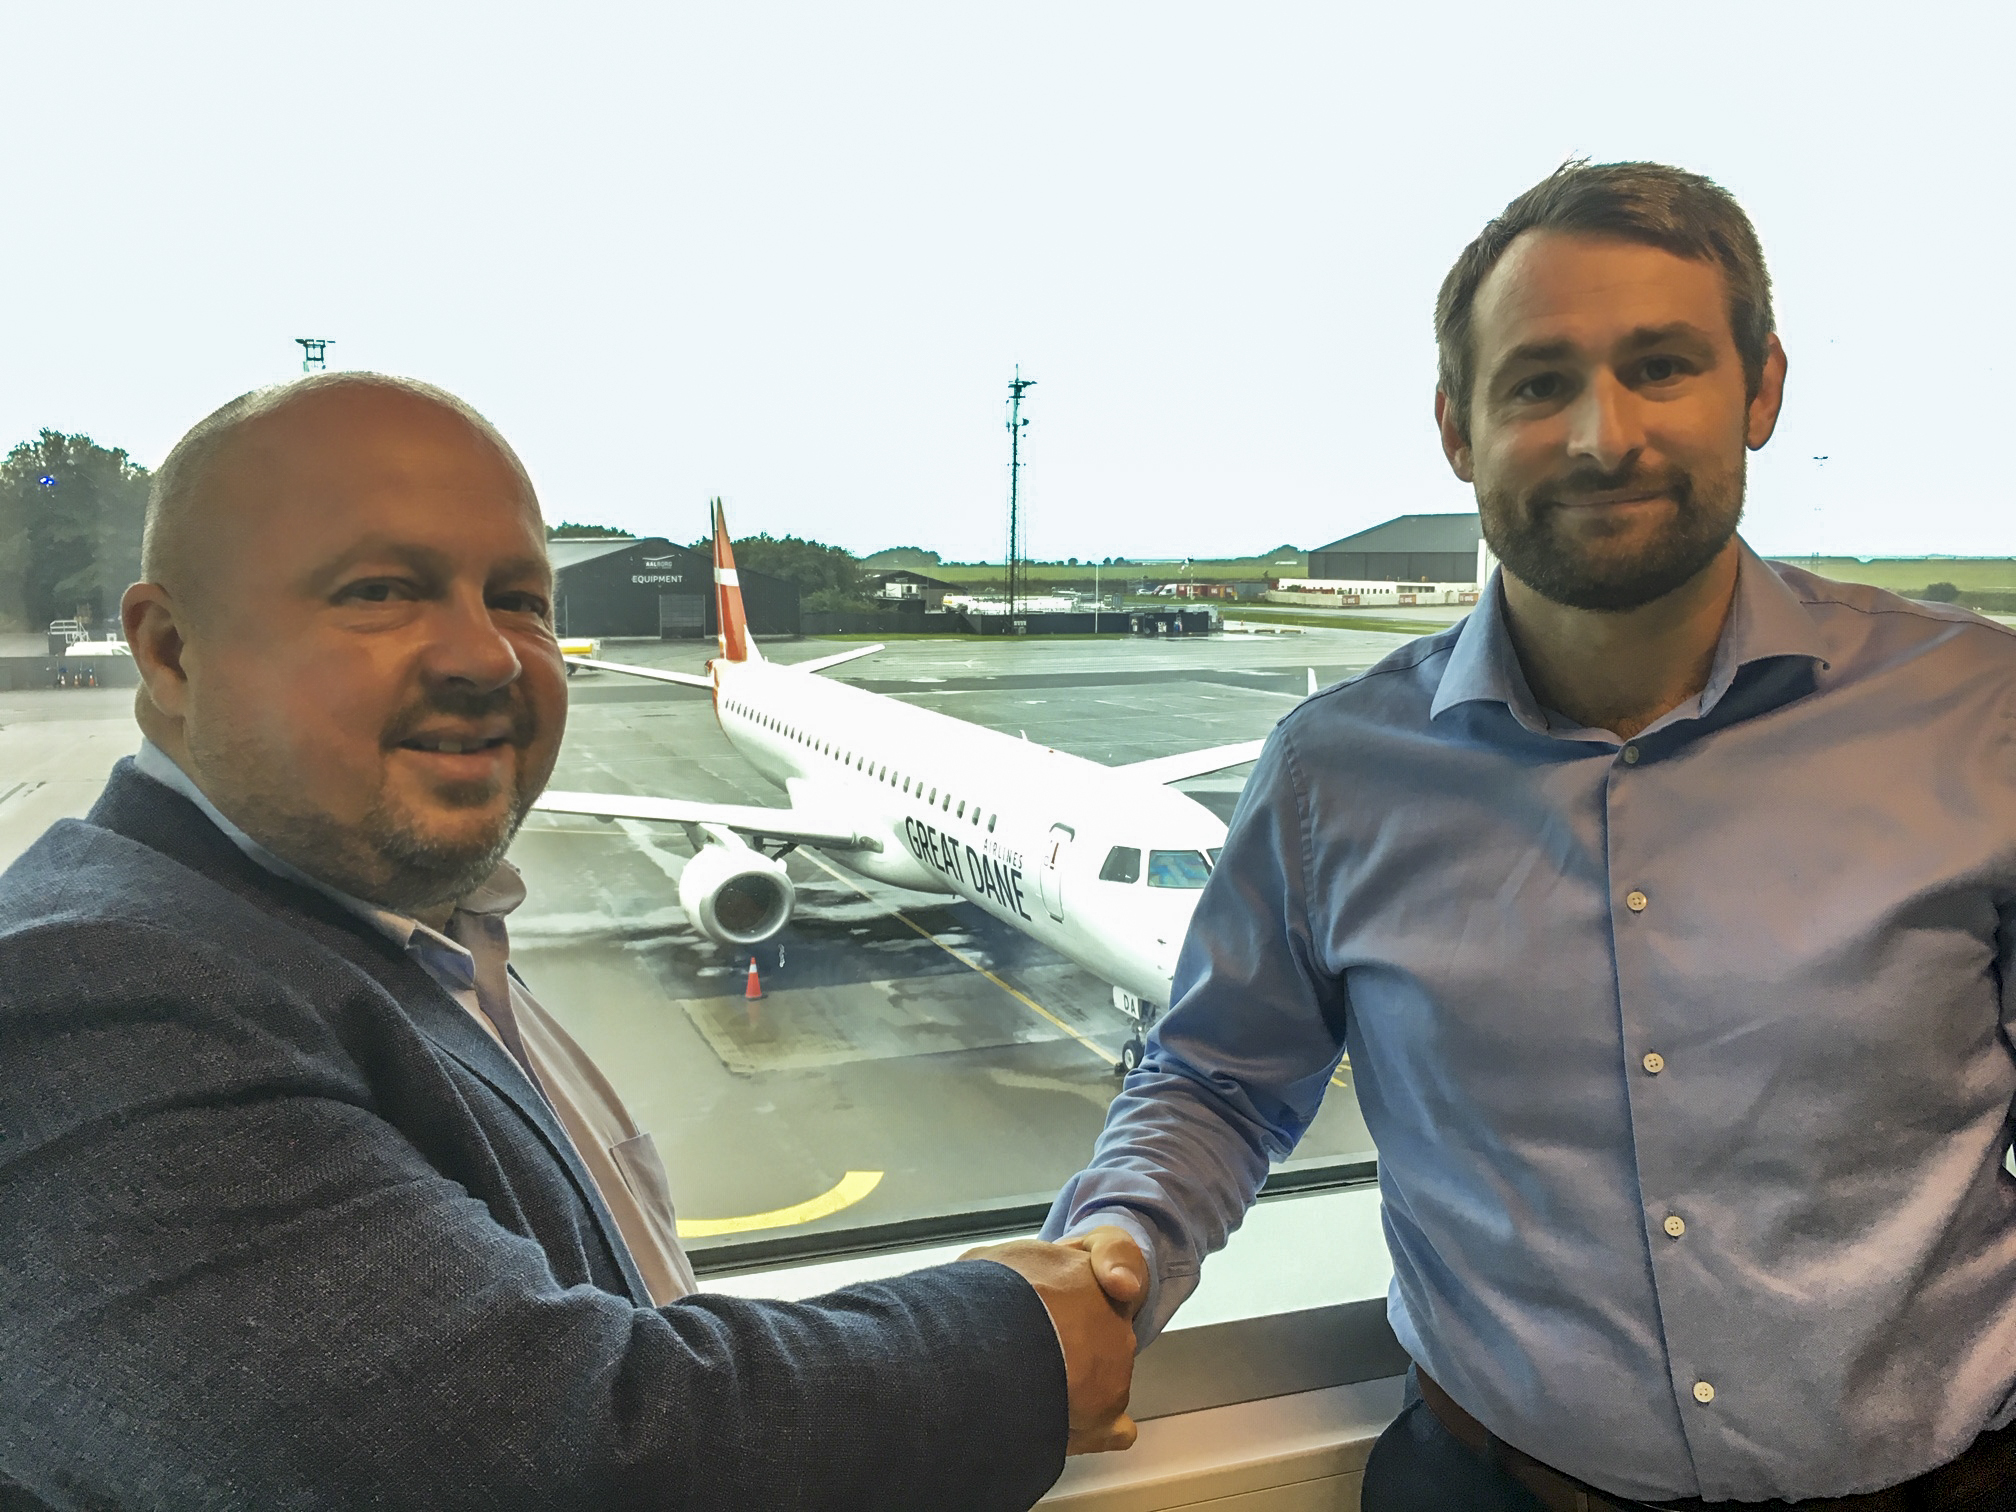 Bravo Tours' administrerende direktør, Peder Hornshøj, til venstre, giver hånd på den nye flyaftale til Great Dane Airlines' administrerende direktør, Thomas Hugo Møller. Pressefoto: Great Dane Airlines.